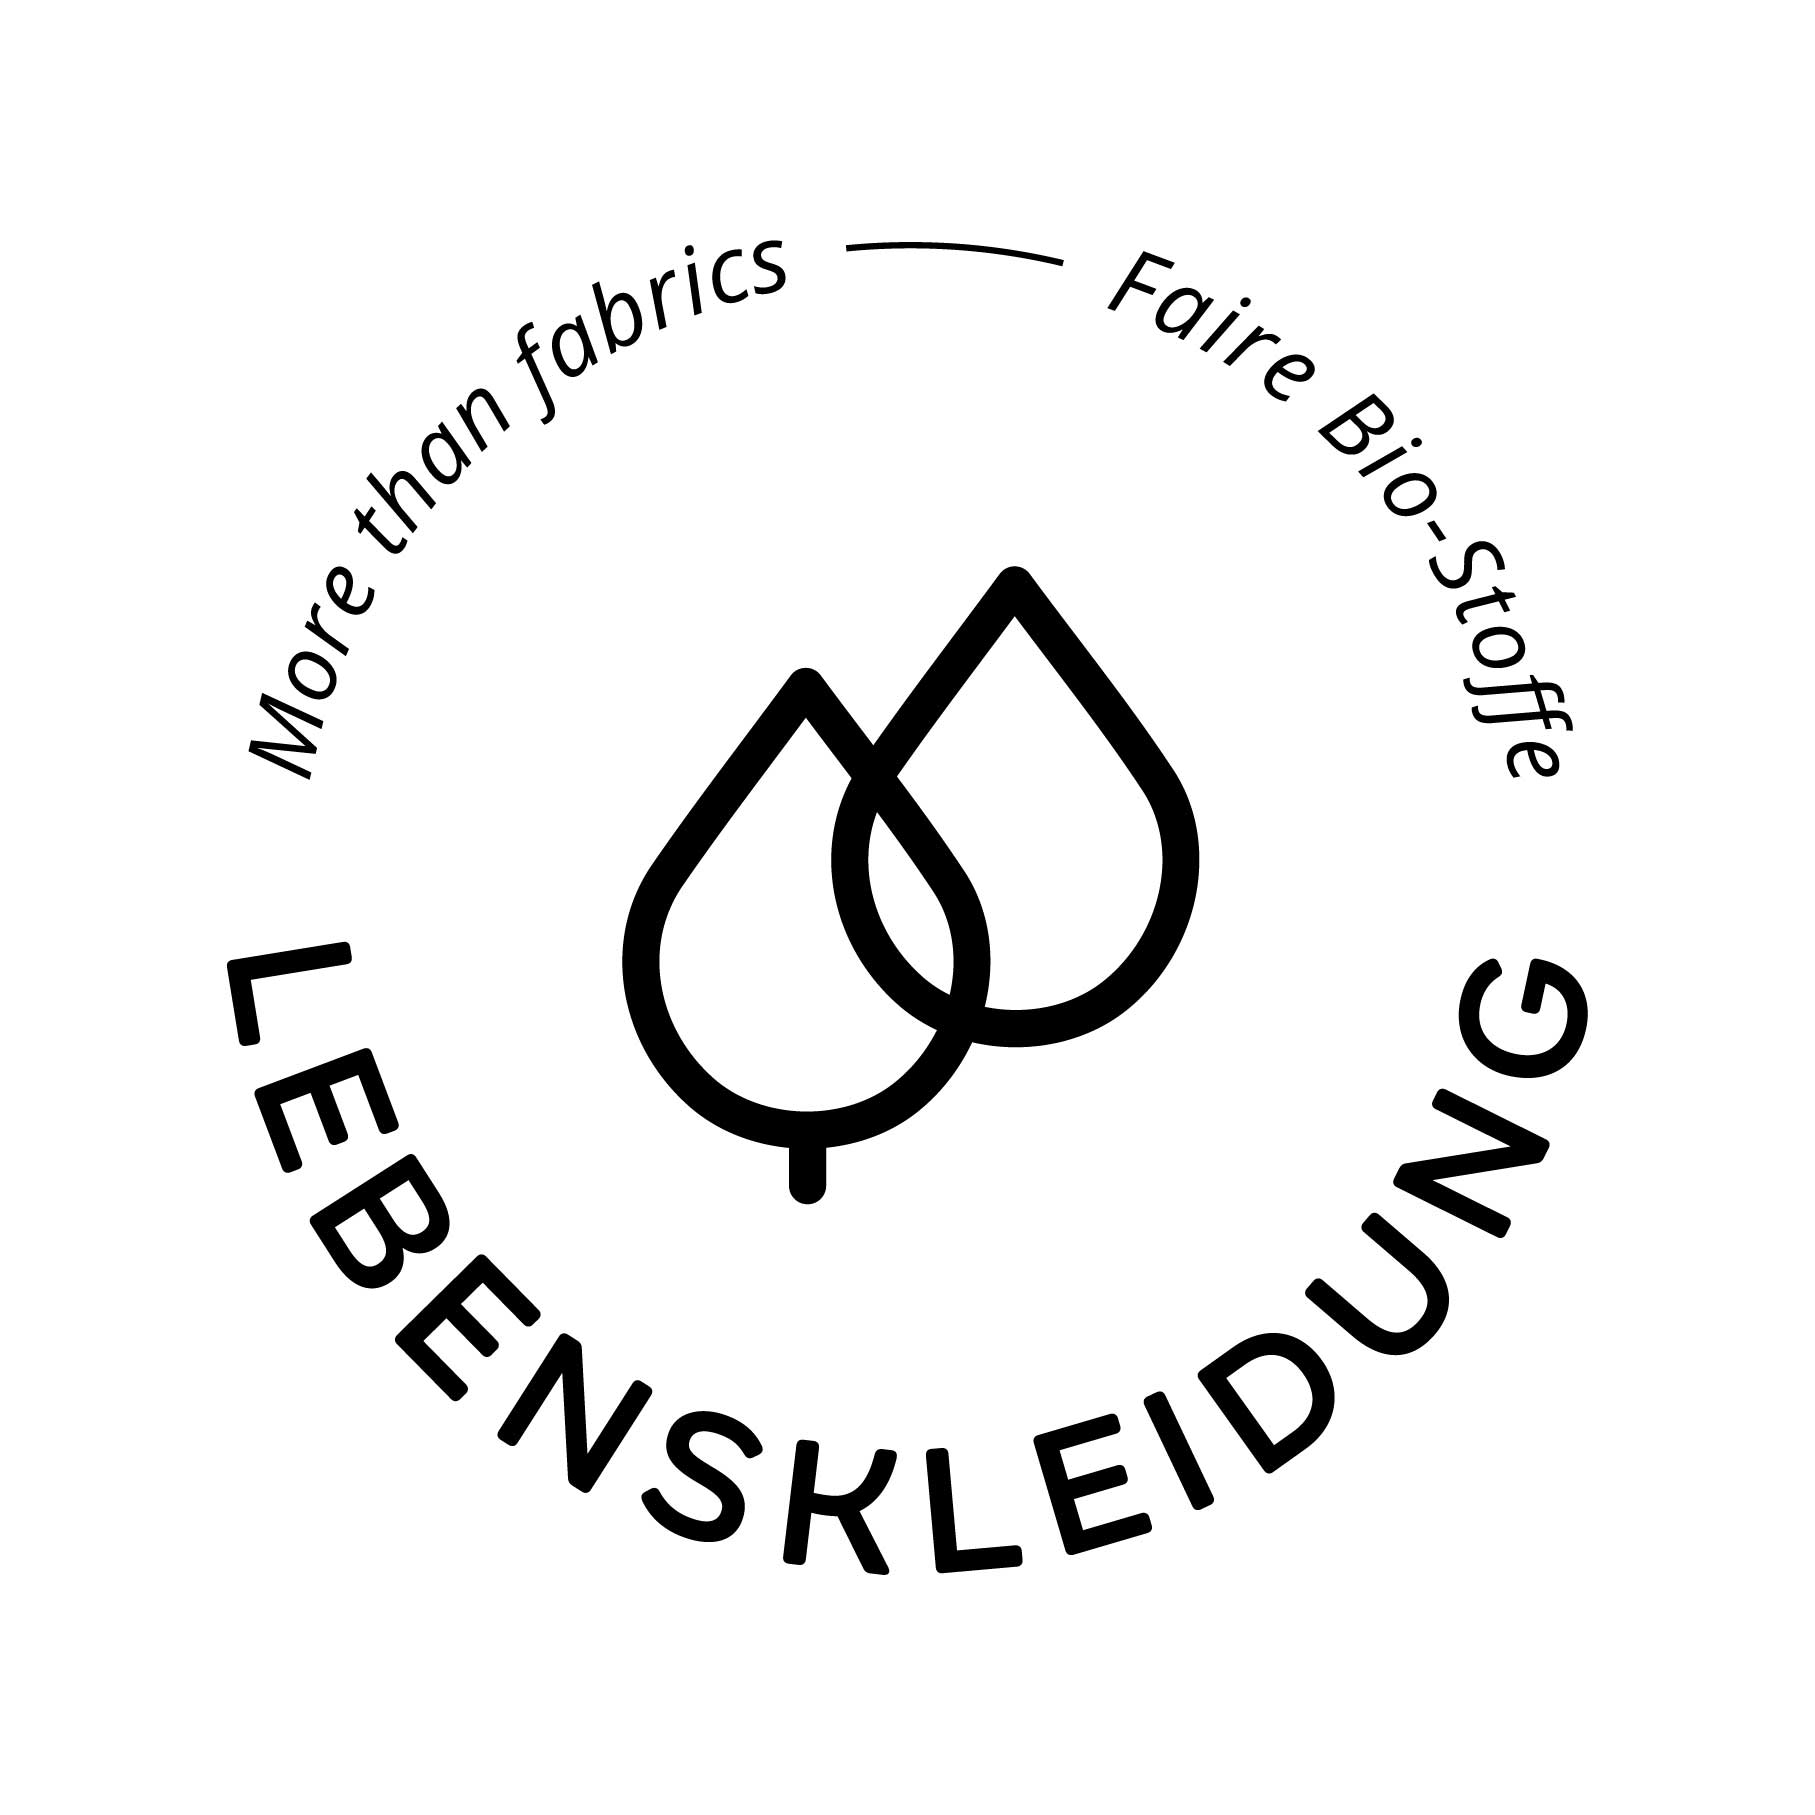 Organic RIB 2x1 (Cuff fabric) - Black marl